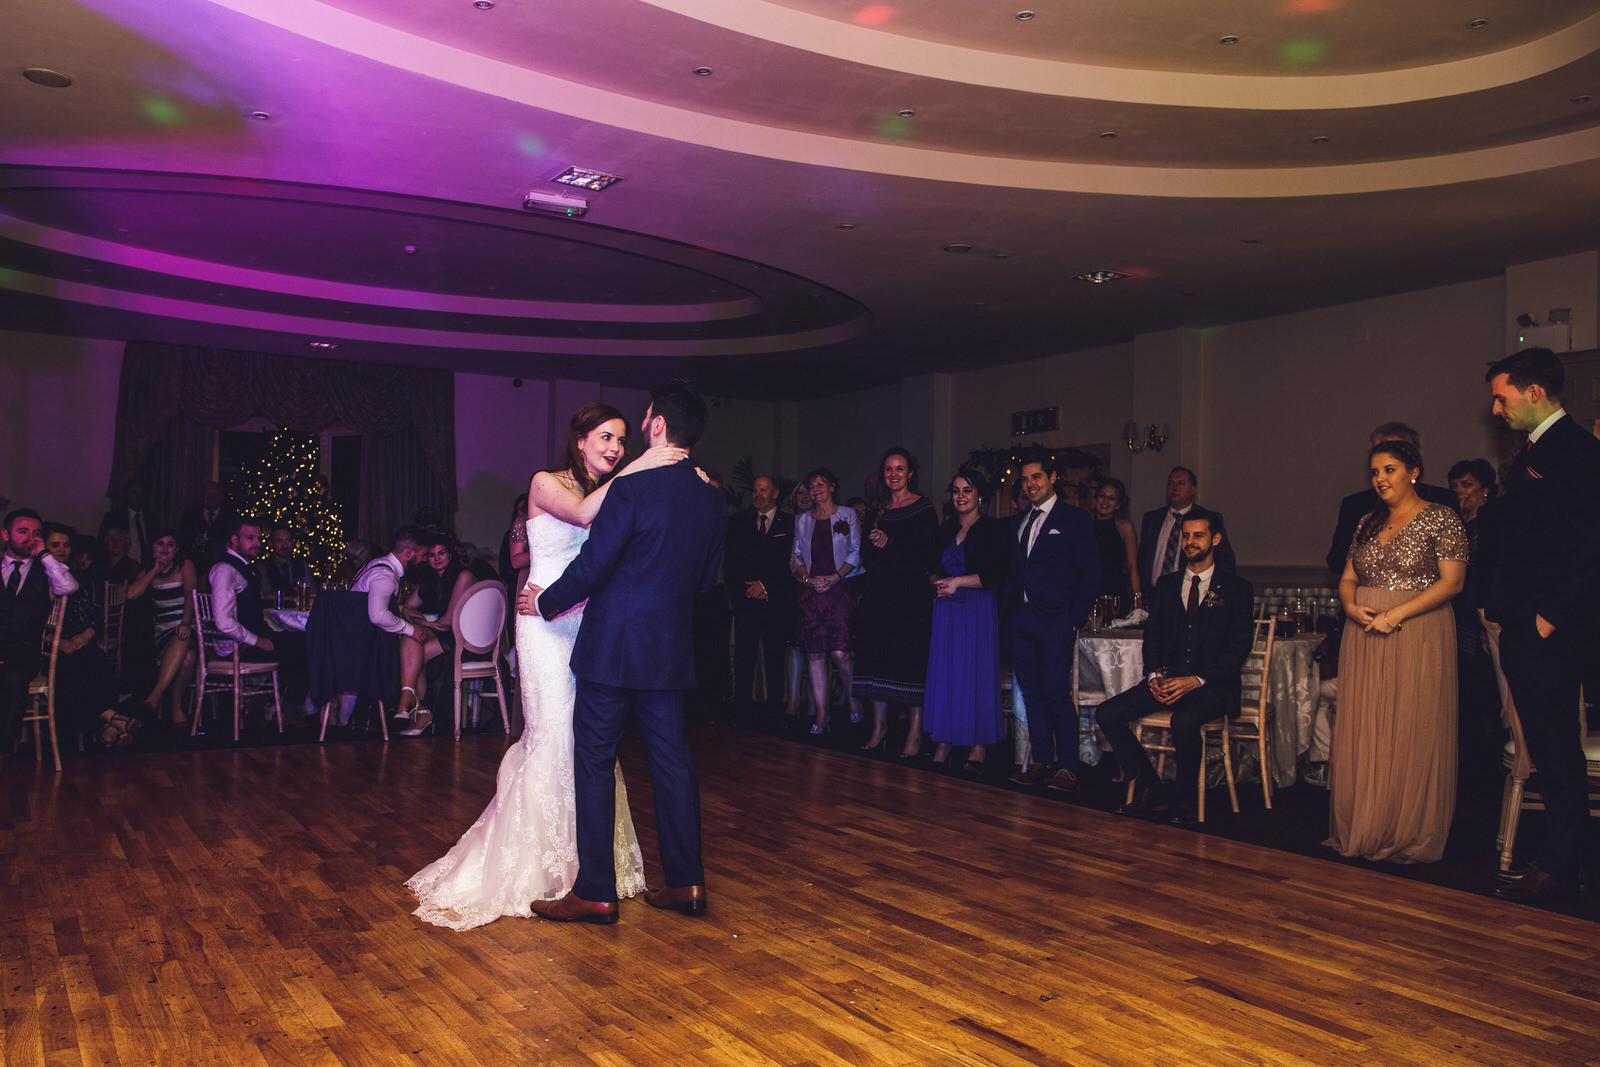 Roger-kenny-wedding-photographer-greystones-wicklow-dublin_124.jpg